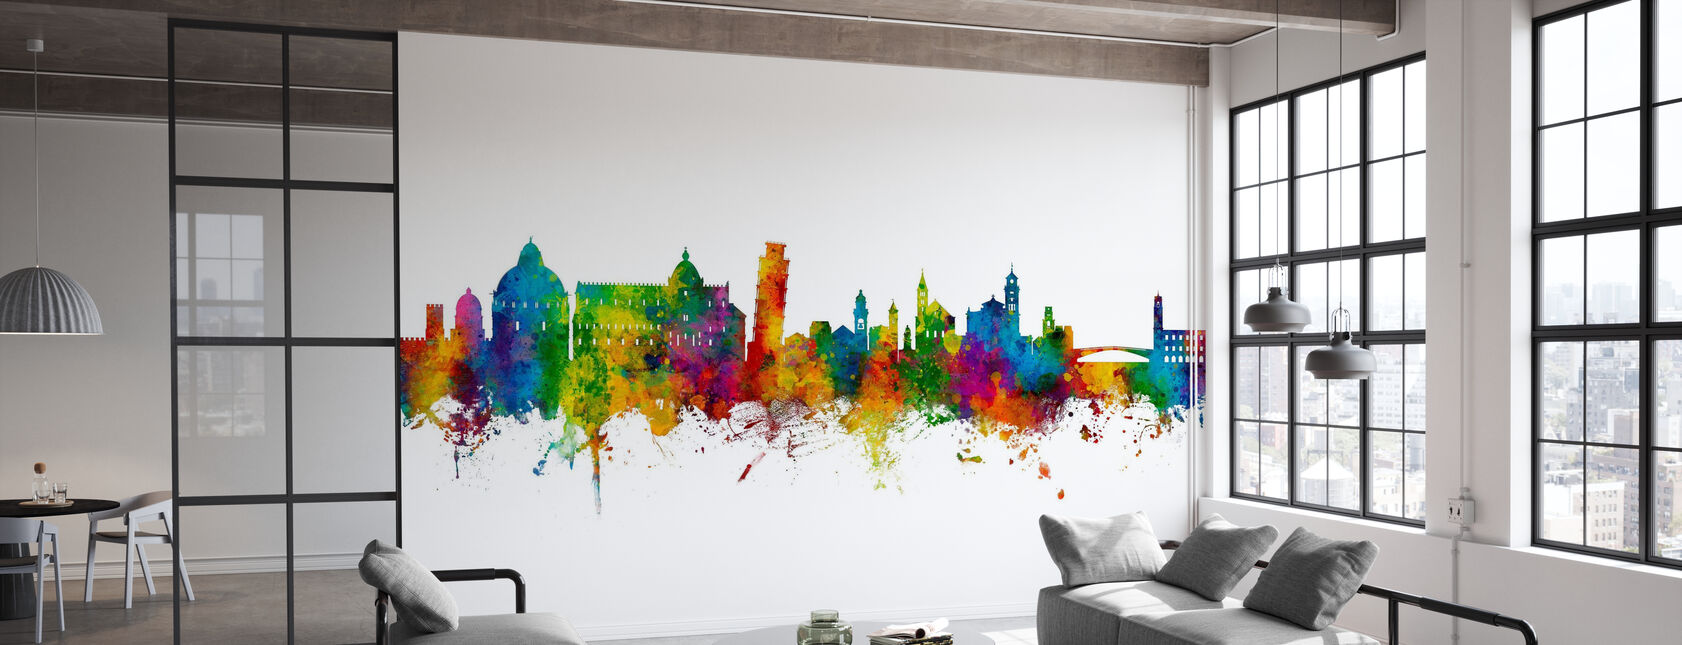 Pisa Italy Skyline - Wallpaper - Office